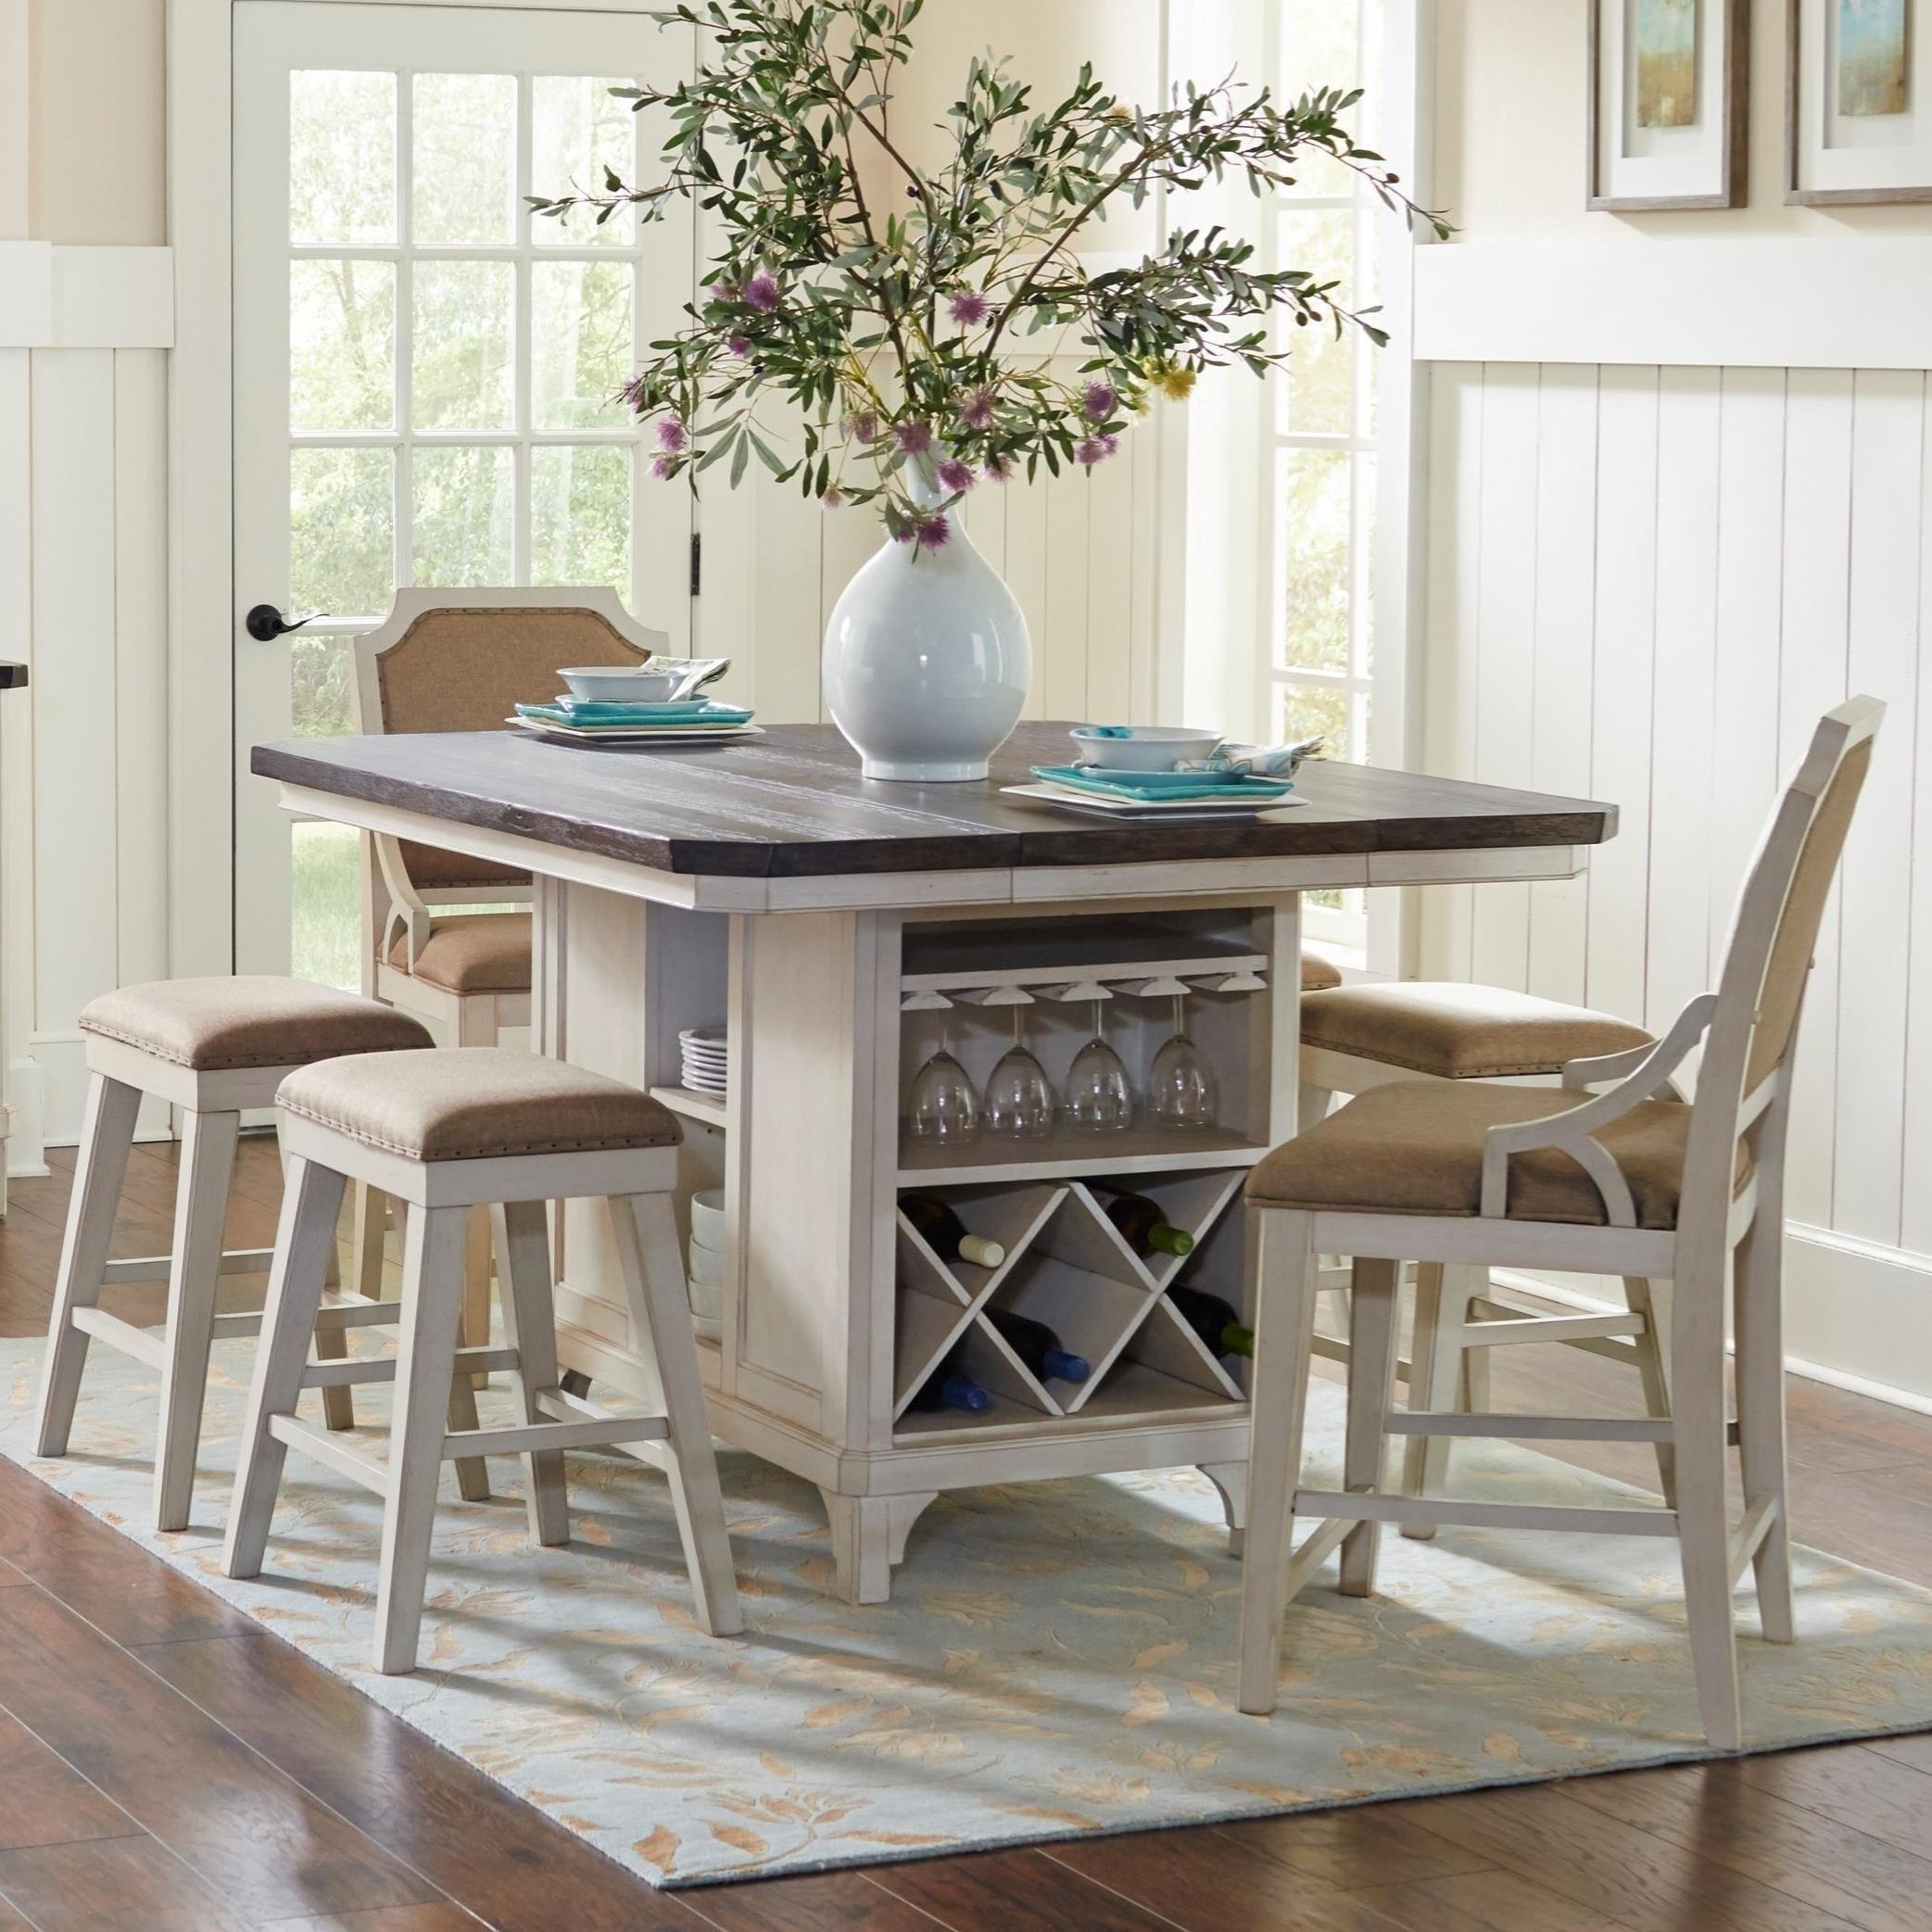 Avalon Furniture Mystic Cay7 Piece Kitchen Island Table Set ...